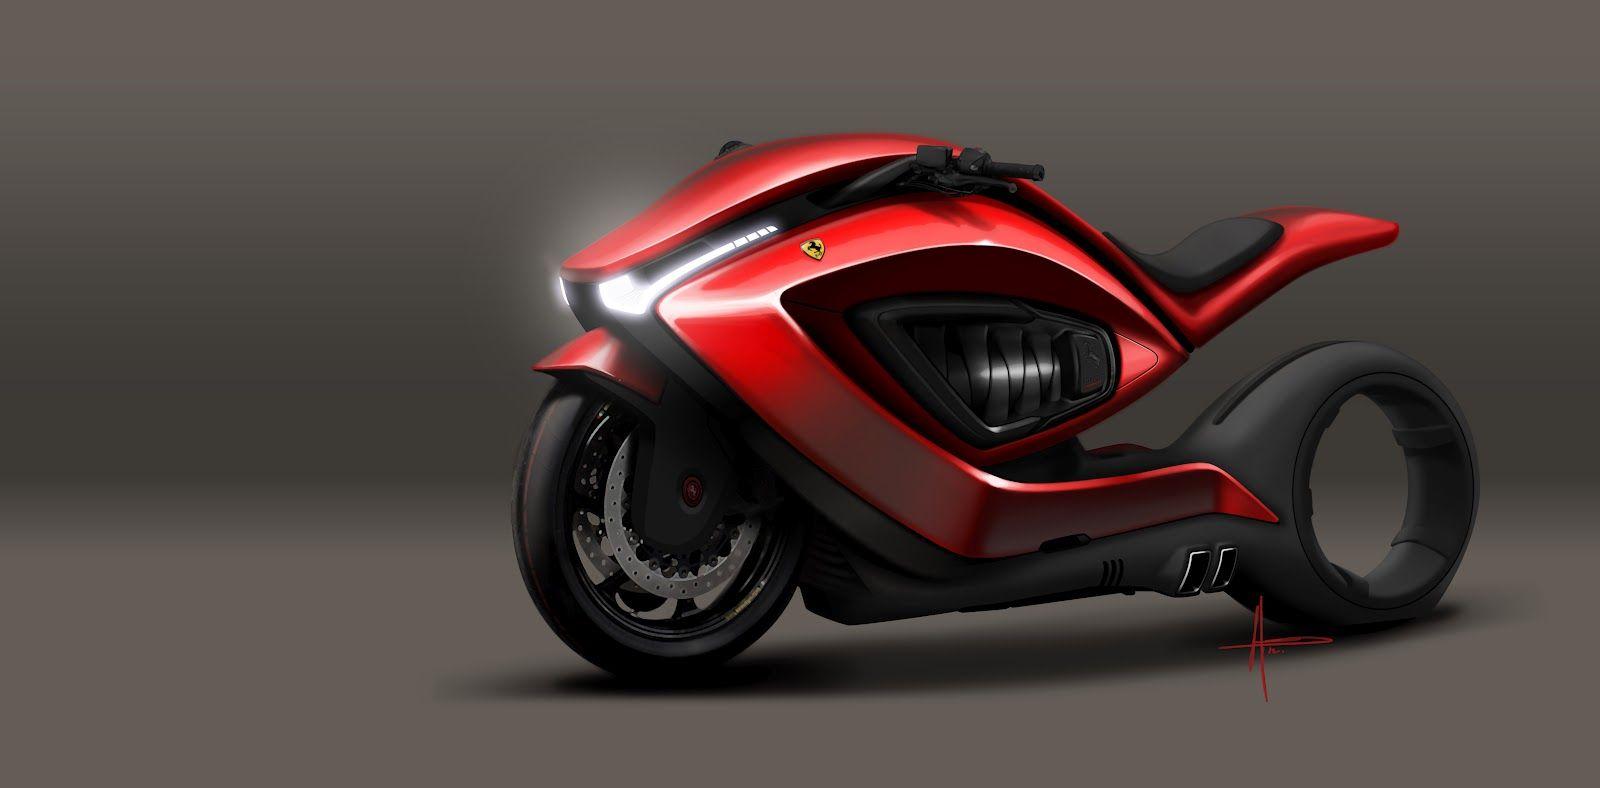 Ferrari Motorcycle Test Ferrari Motorcycle